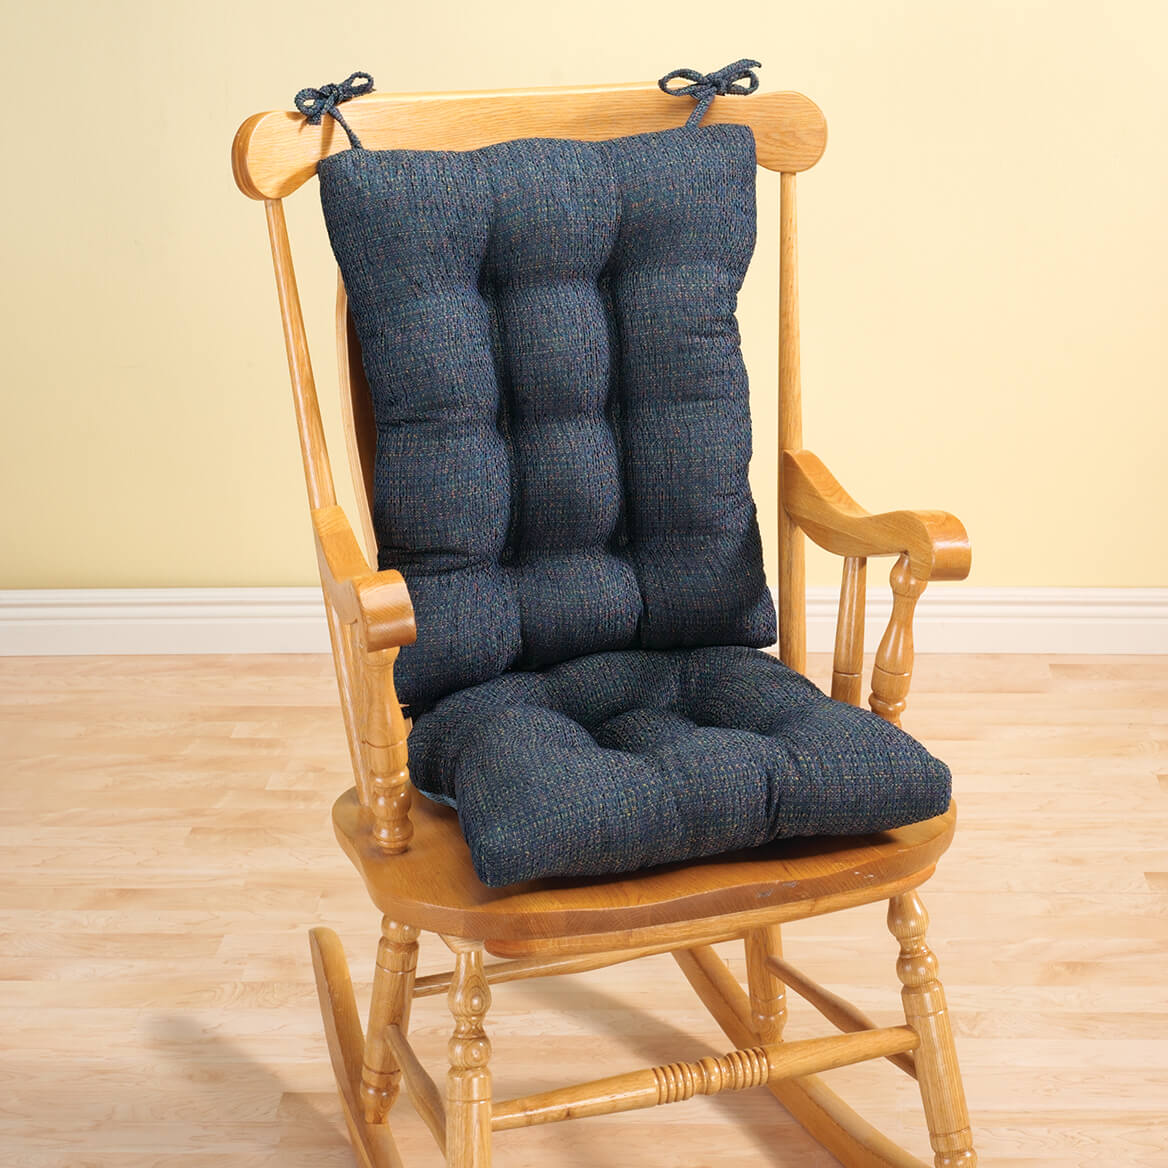 Tyson Deluxe Rocker Cushion Set